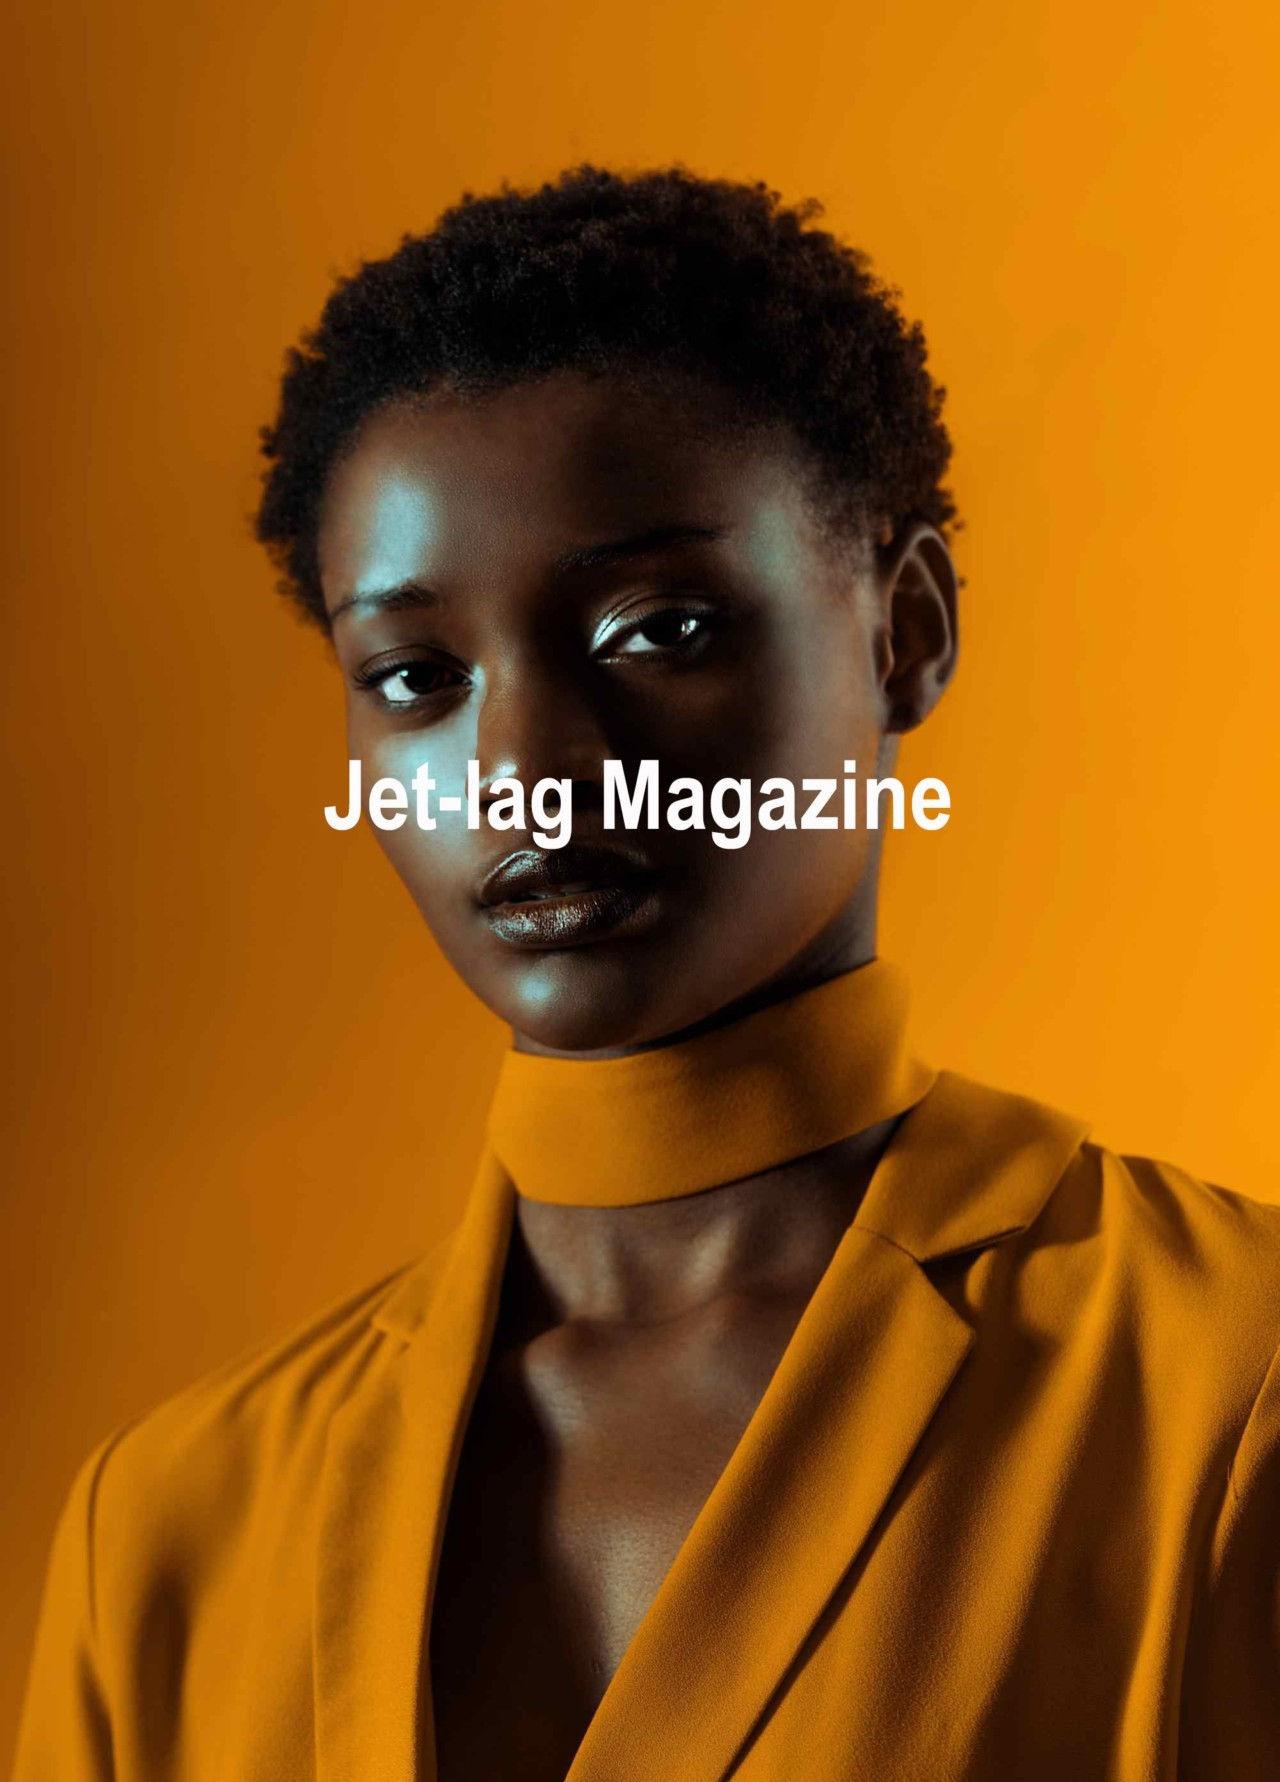 Jet-lag magazine 16